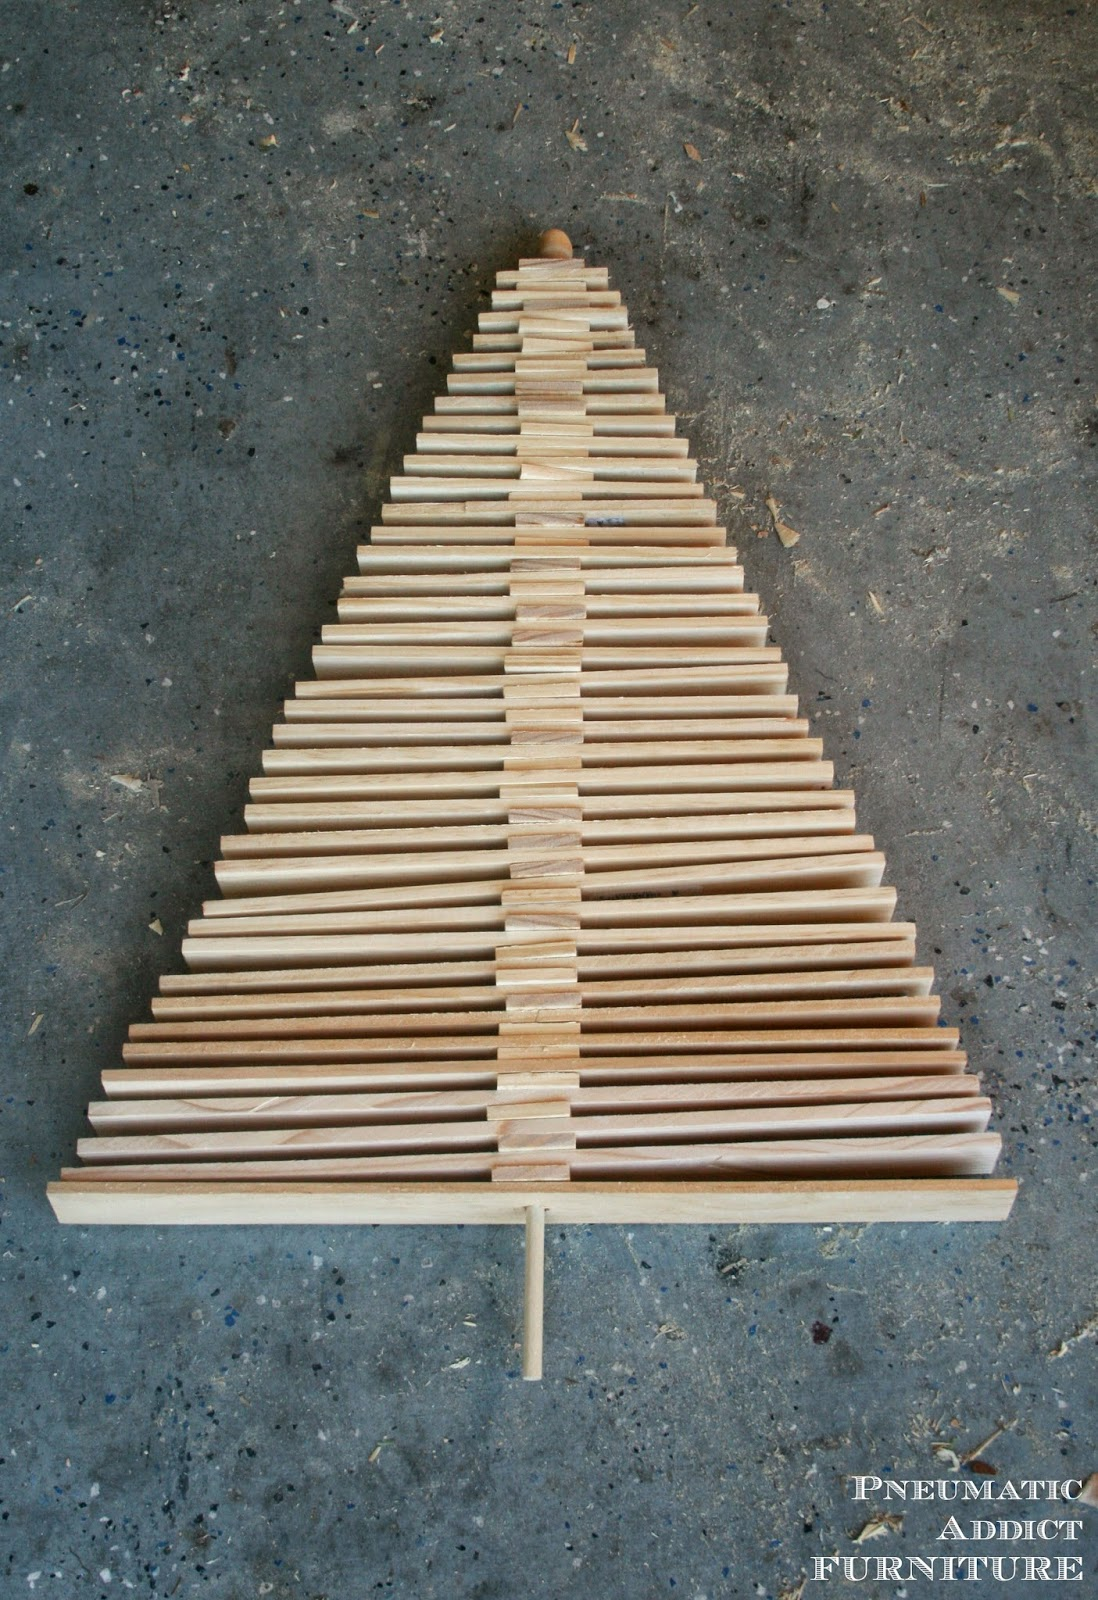 DIY Wood Slat Christmas Tree   Pneumatic Addict